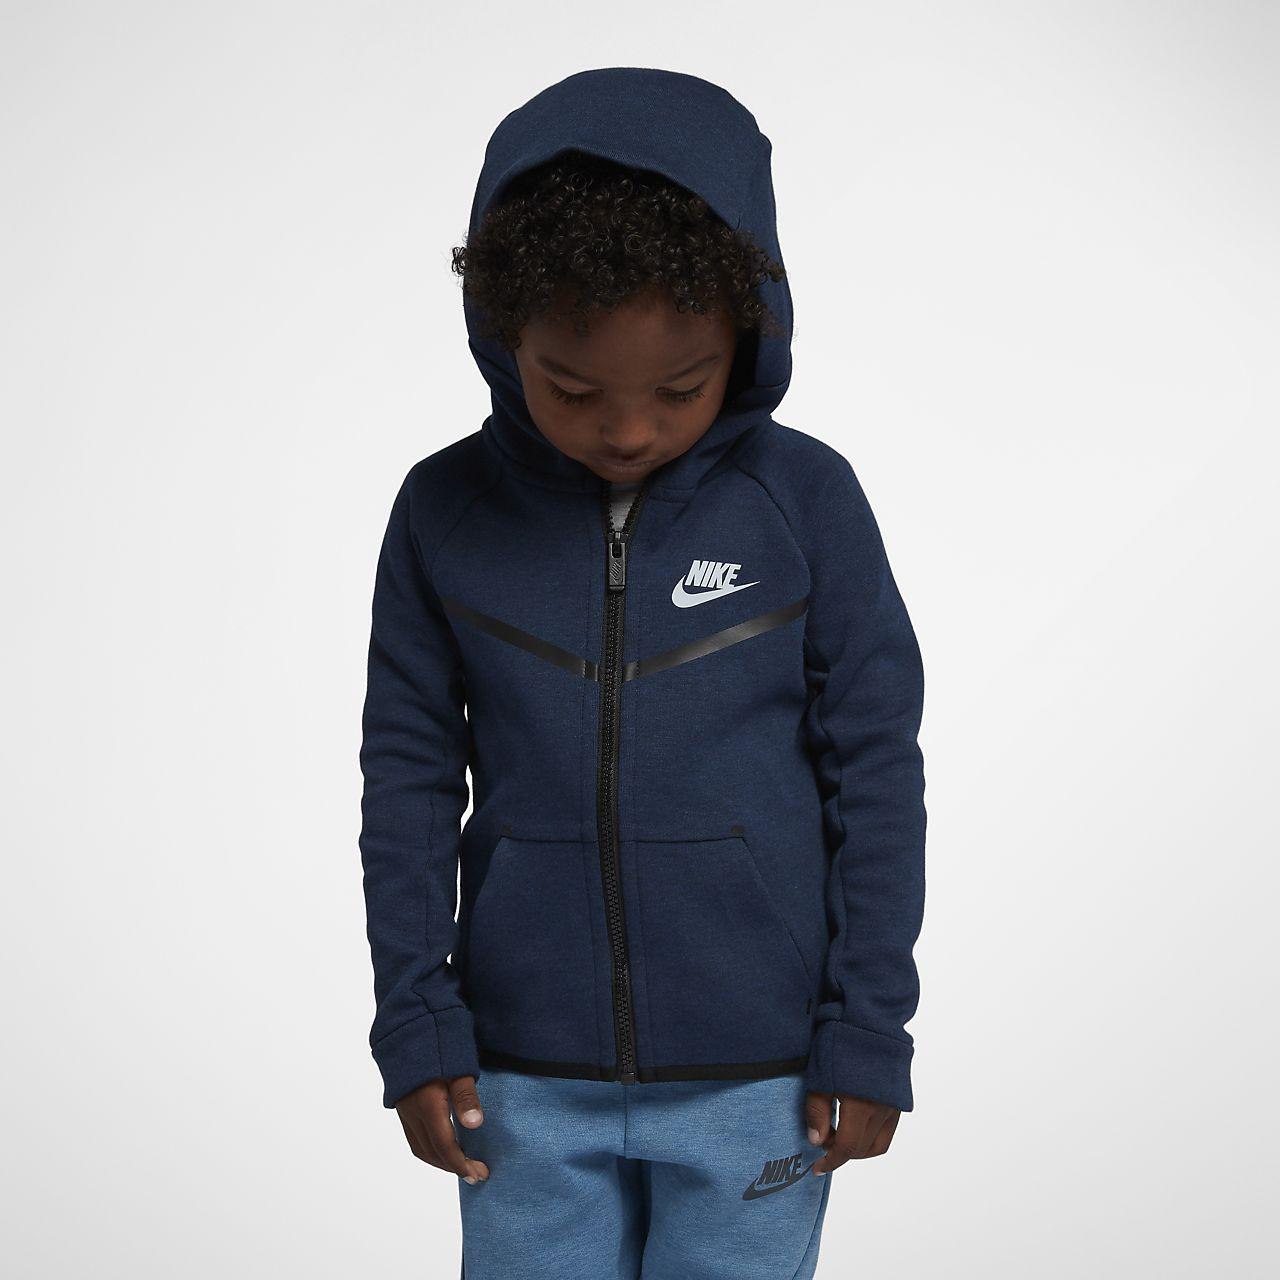 Niño Fleece Nike Tech Sportswear Sudadera Capucha Pequeño Con zPZYP7n